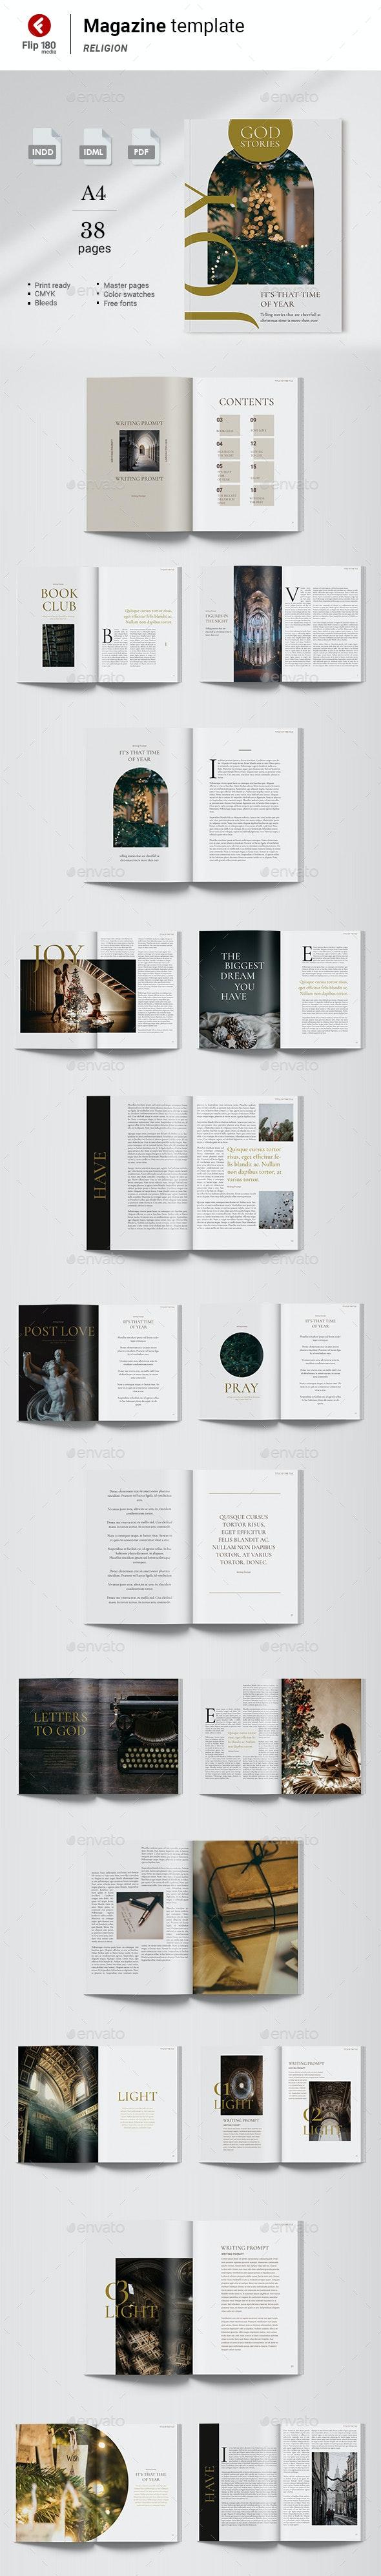 God Stories Magazine Template - Magazines Print Templates